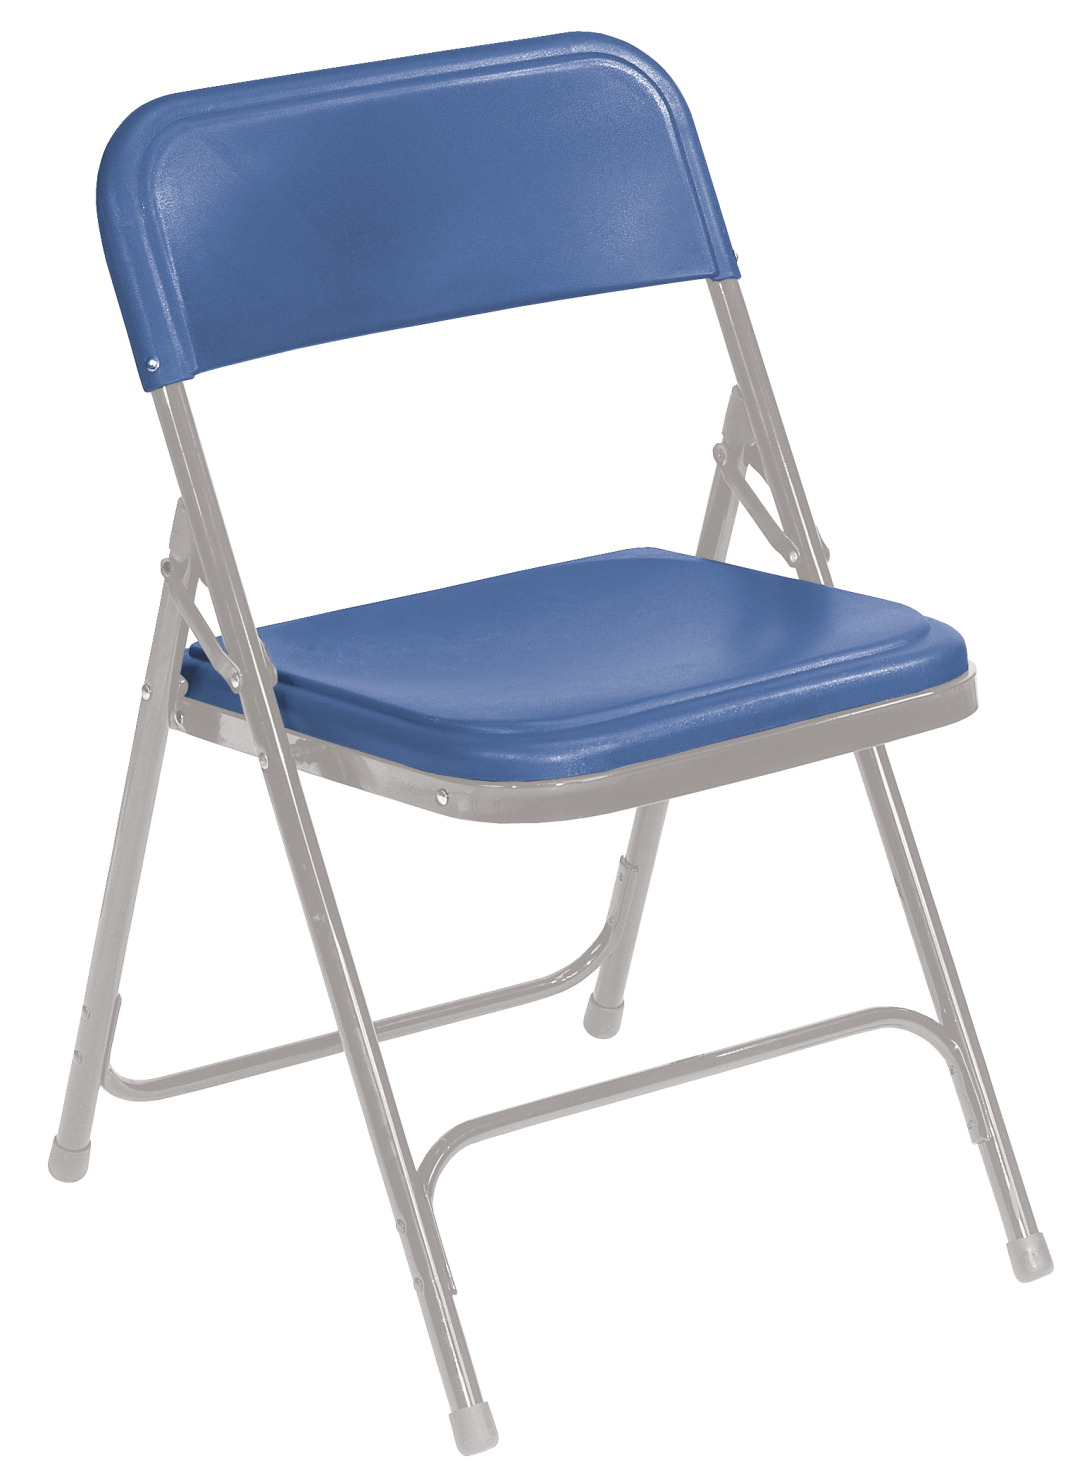 Stupendous National Public Seating 800 Premium Light Weight Folding Chair Burgundy Black Frame Download Free Architecture Designs Scobabritishbridgeorg